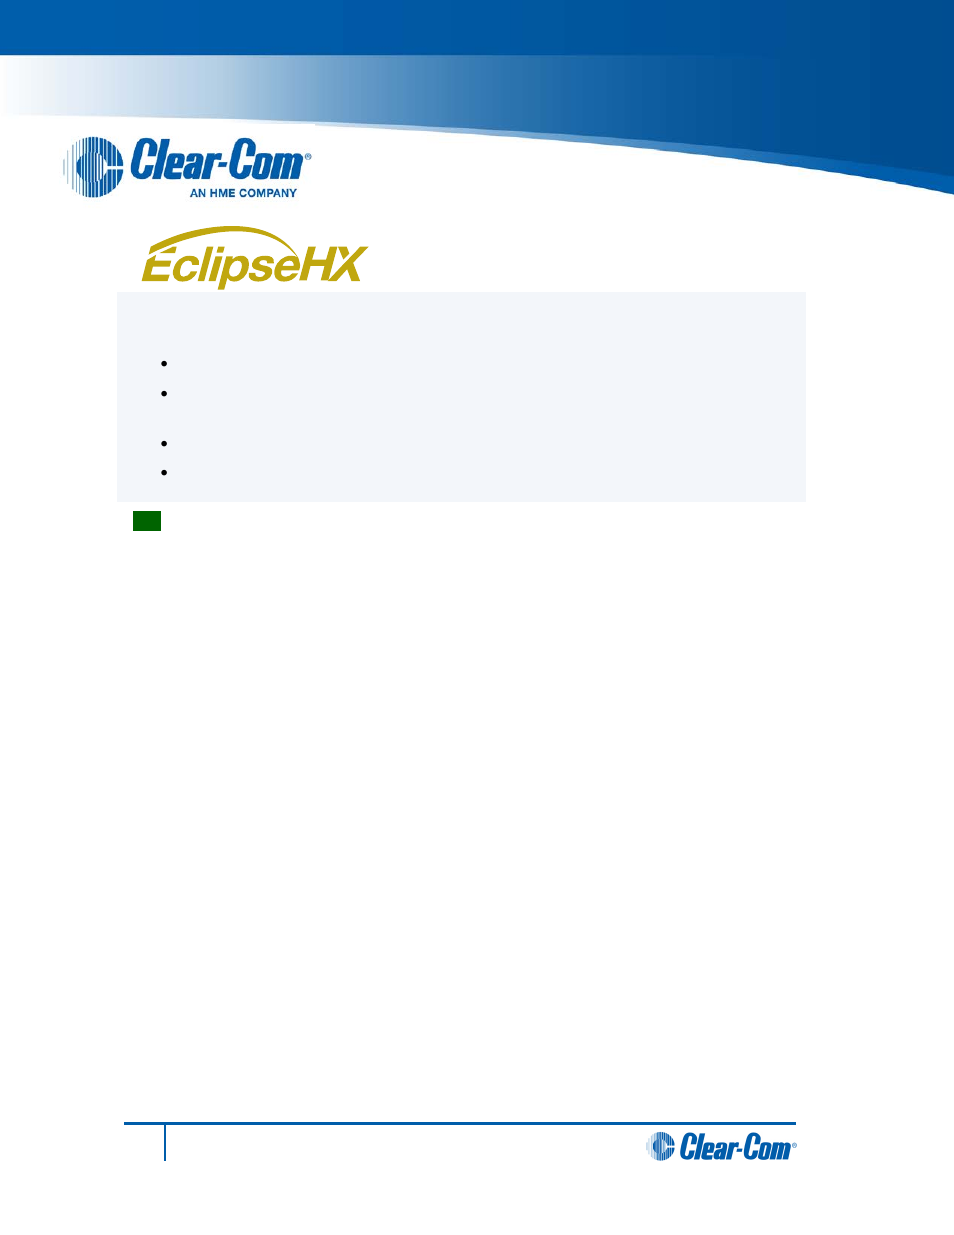 clear com hx system frames user manual 4 pages also for eclipse rh manualsdir com Quick Reference Guide Quick Reference Guide Template